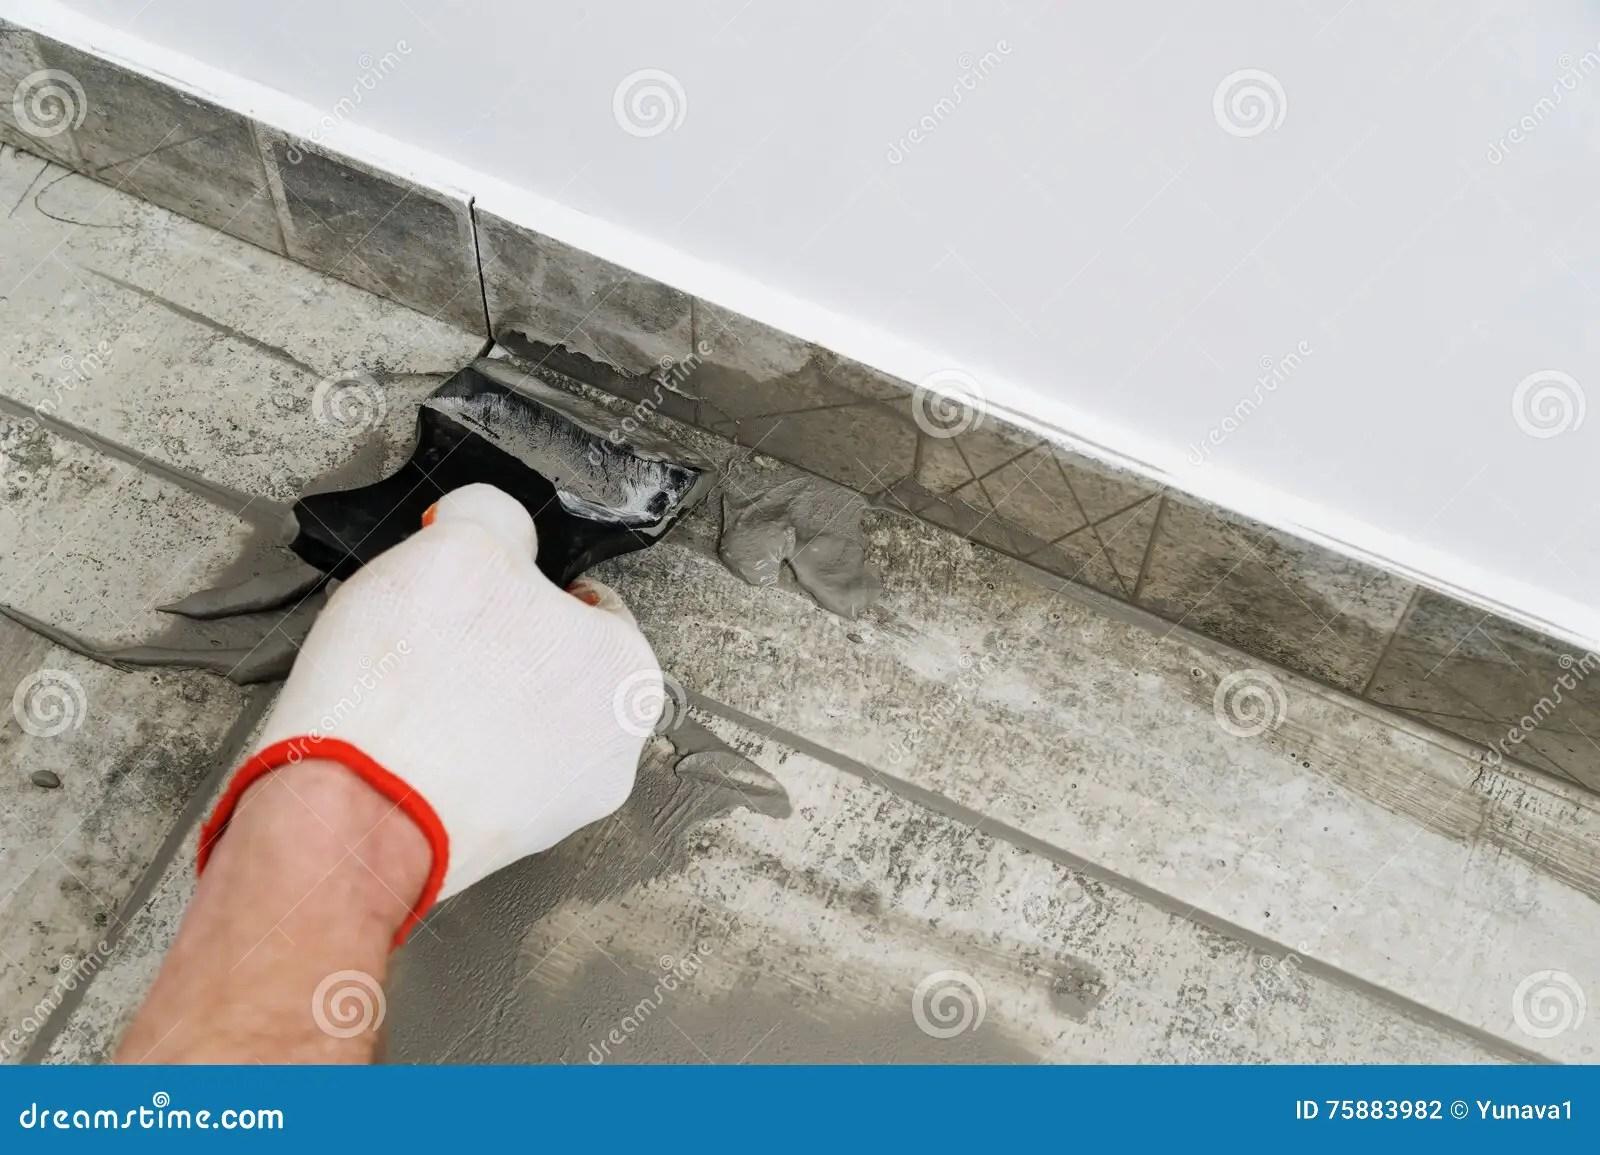 cement tile kitchen chandelier 陶瓷填水泥的瓦片库存照片 图片包括有膏药 陶瓷 墙壁 厨房 现有量 陶瓷填水泥的瓦片